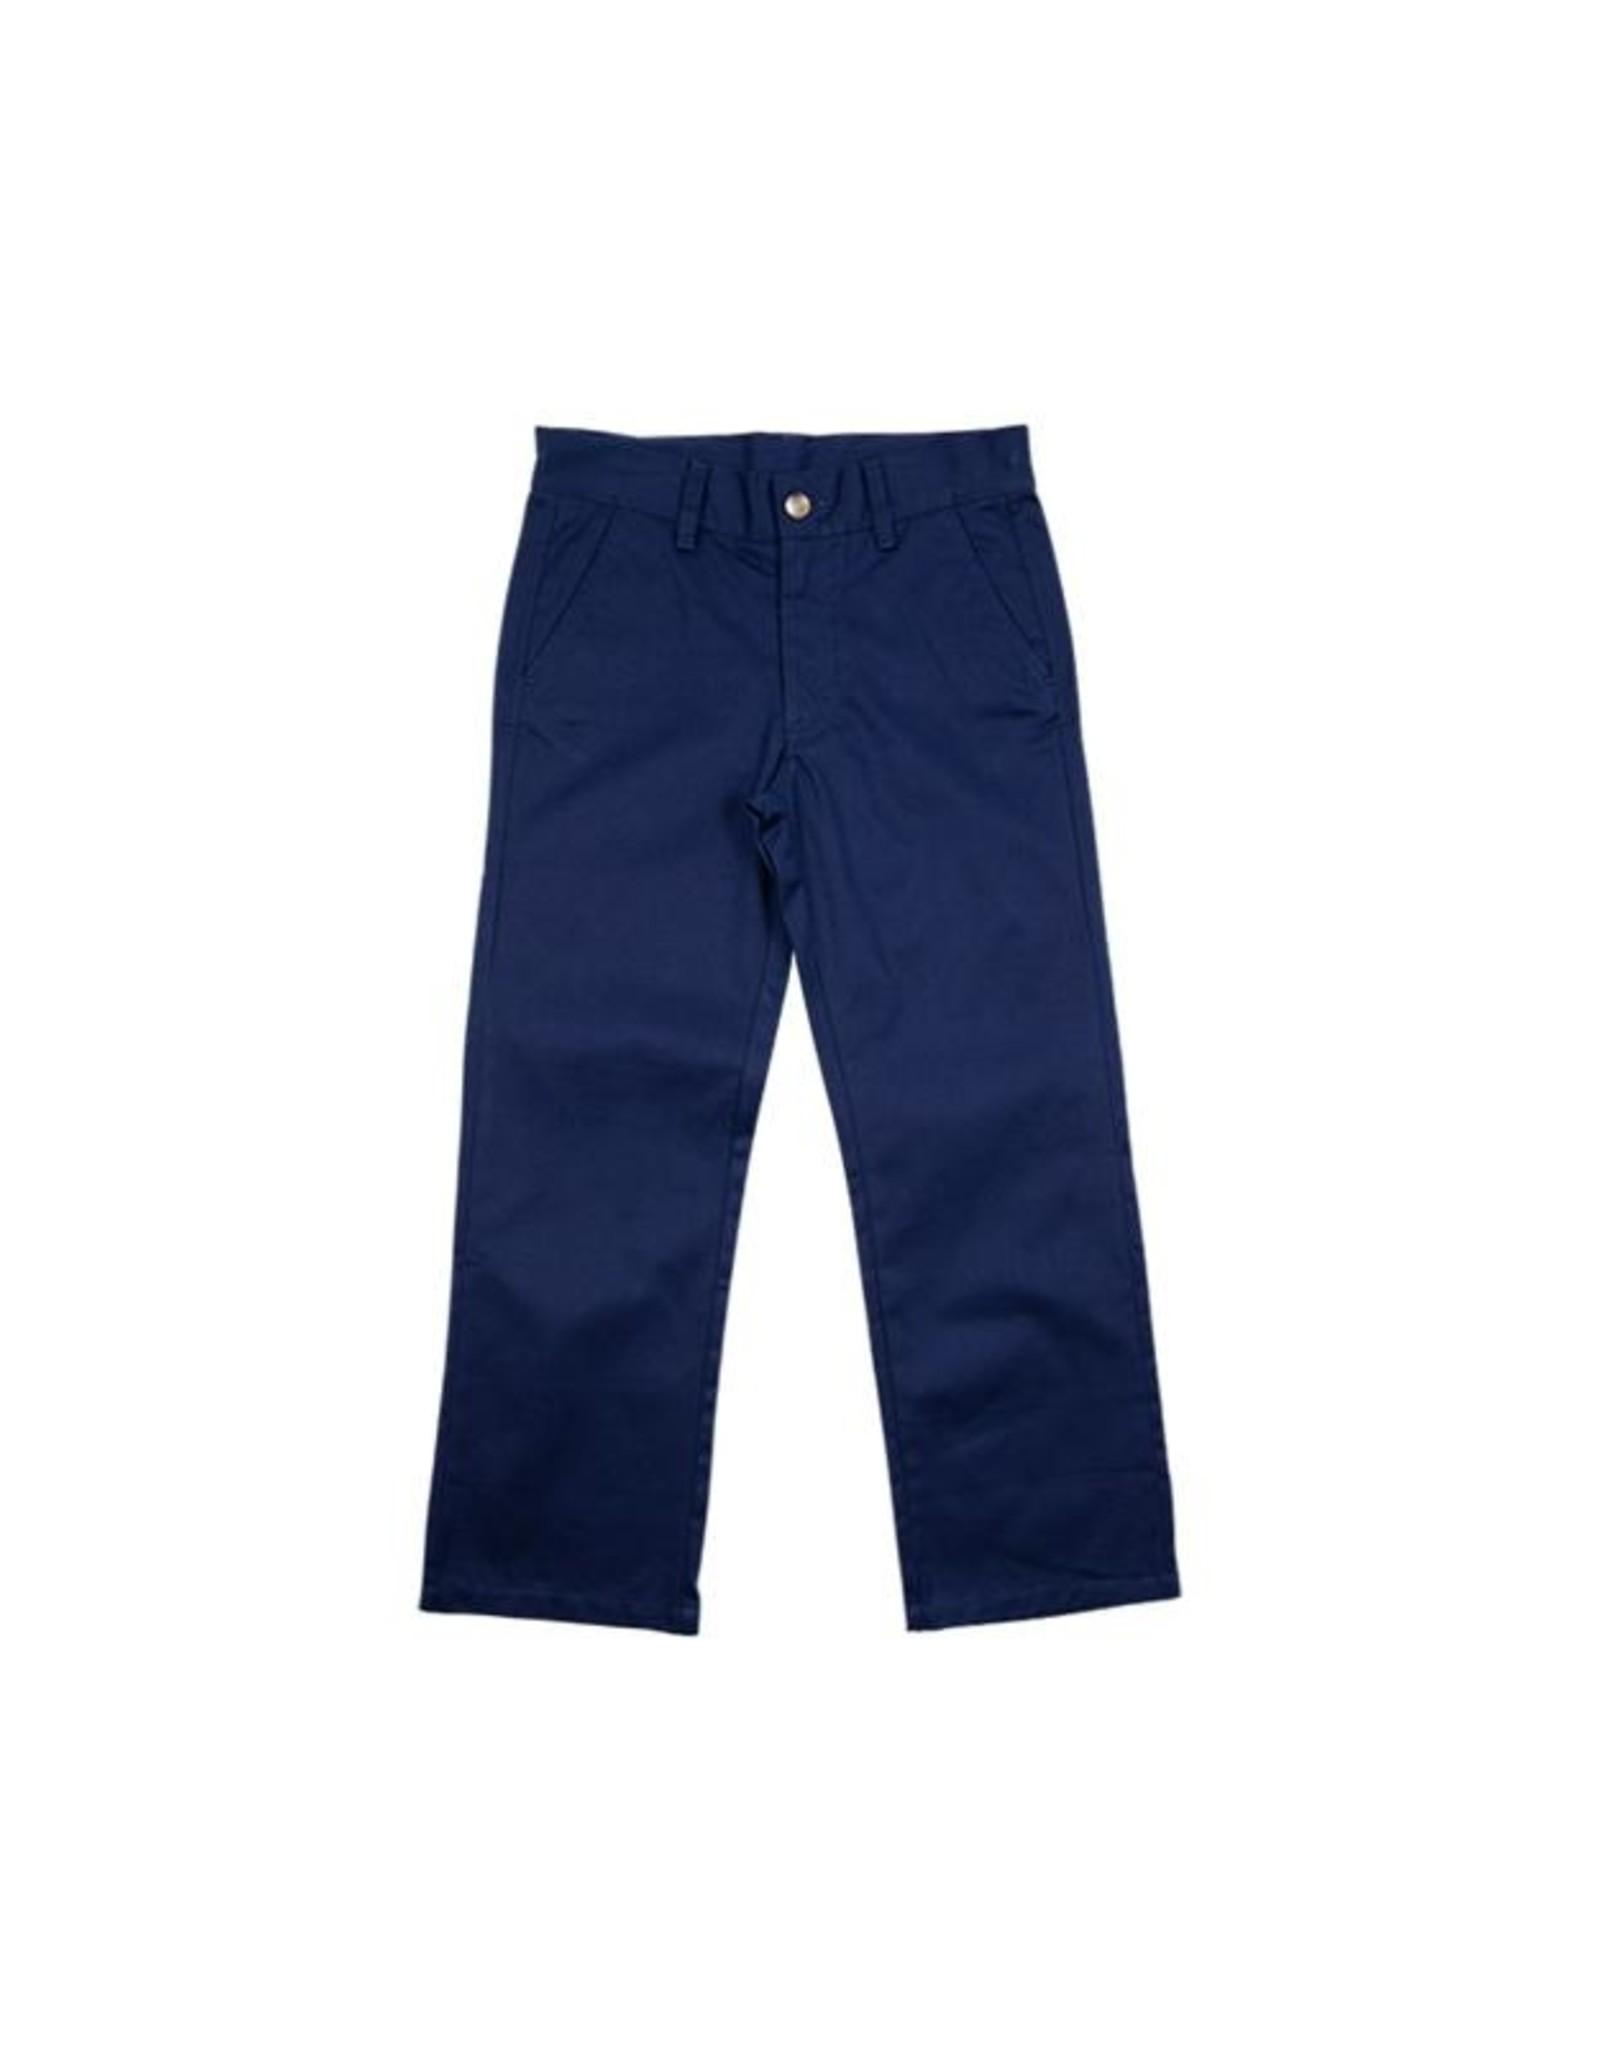 The Beaufort Bonnet Company Prep School Pants Nantucket Navy Twill